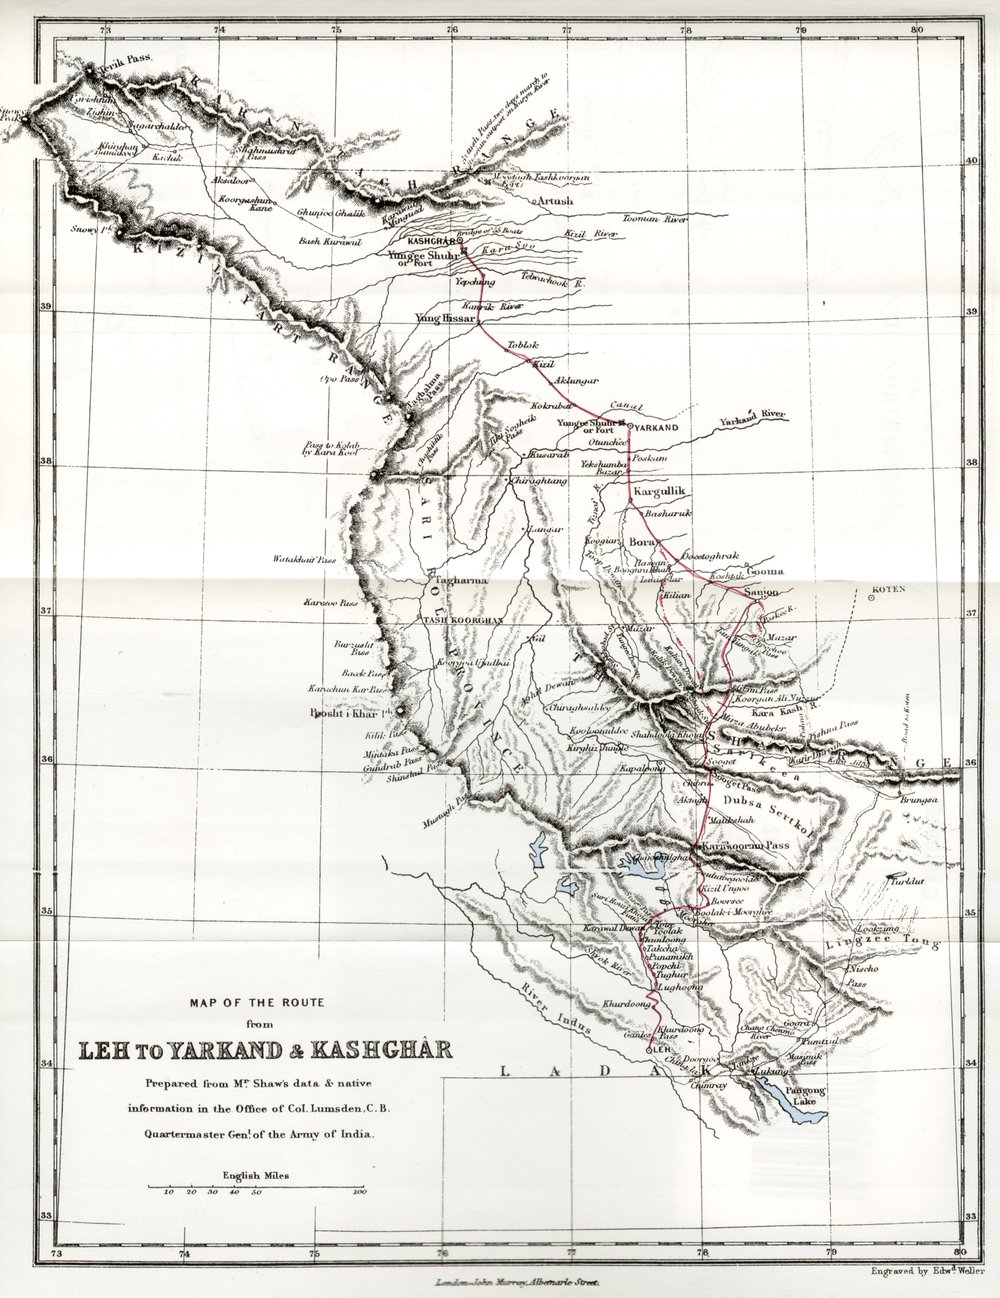 1871 Leh to Yarkand and Kashghar by Robert Shaw.jpg